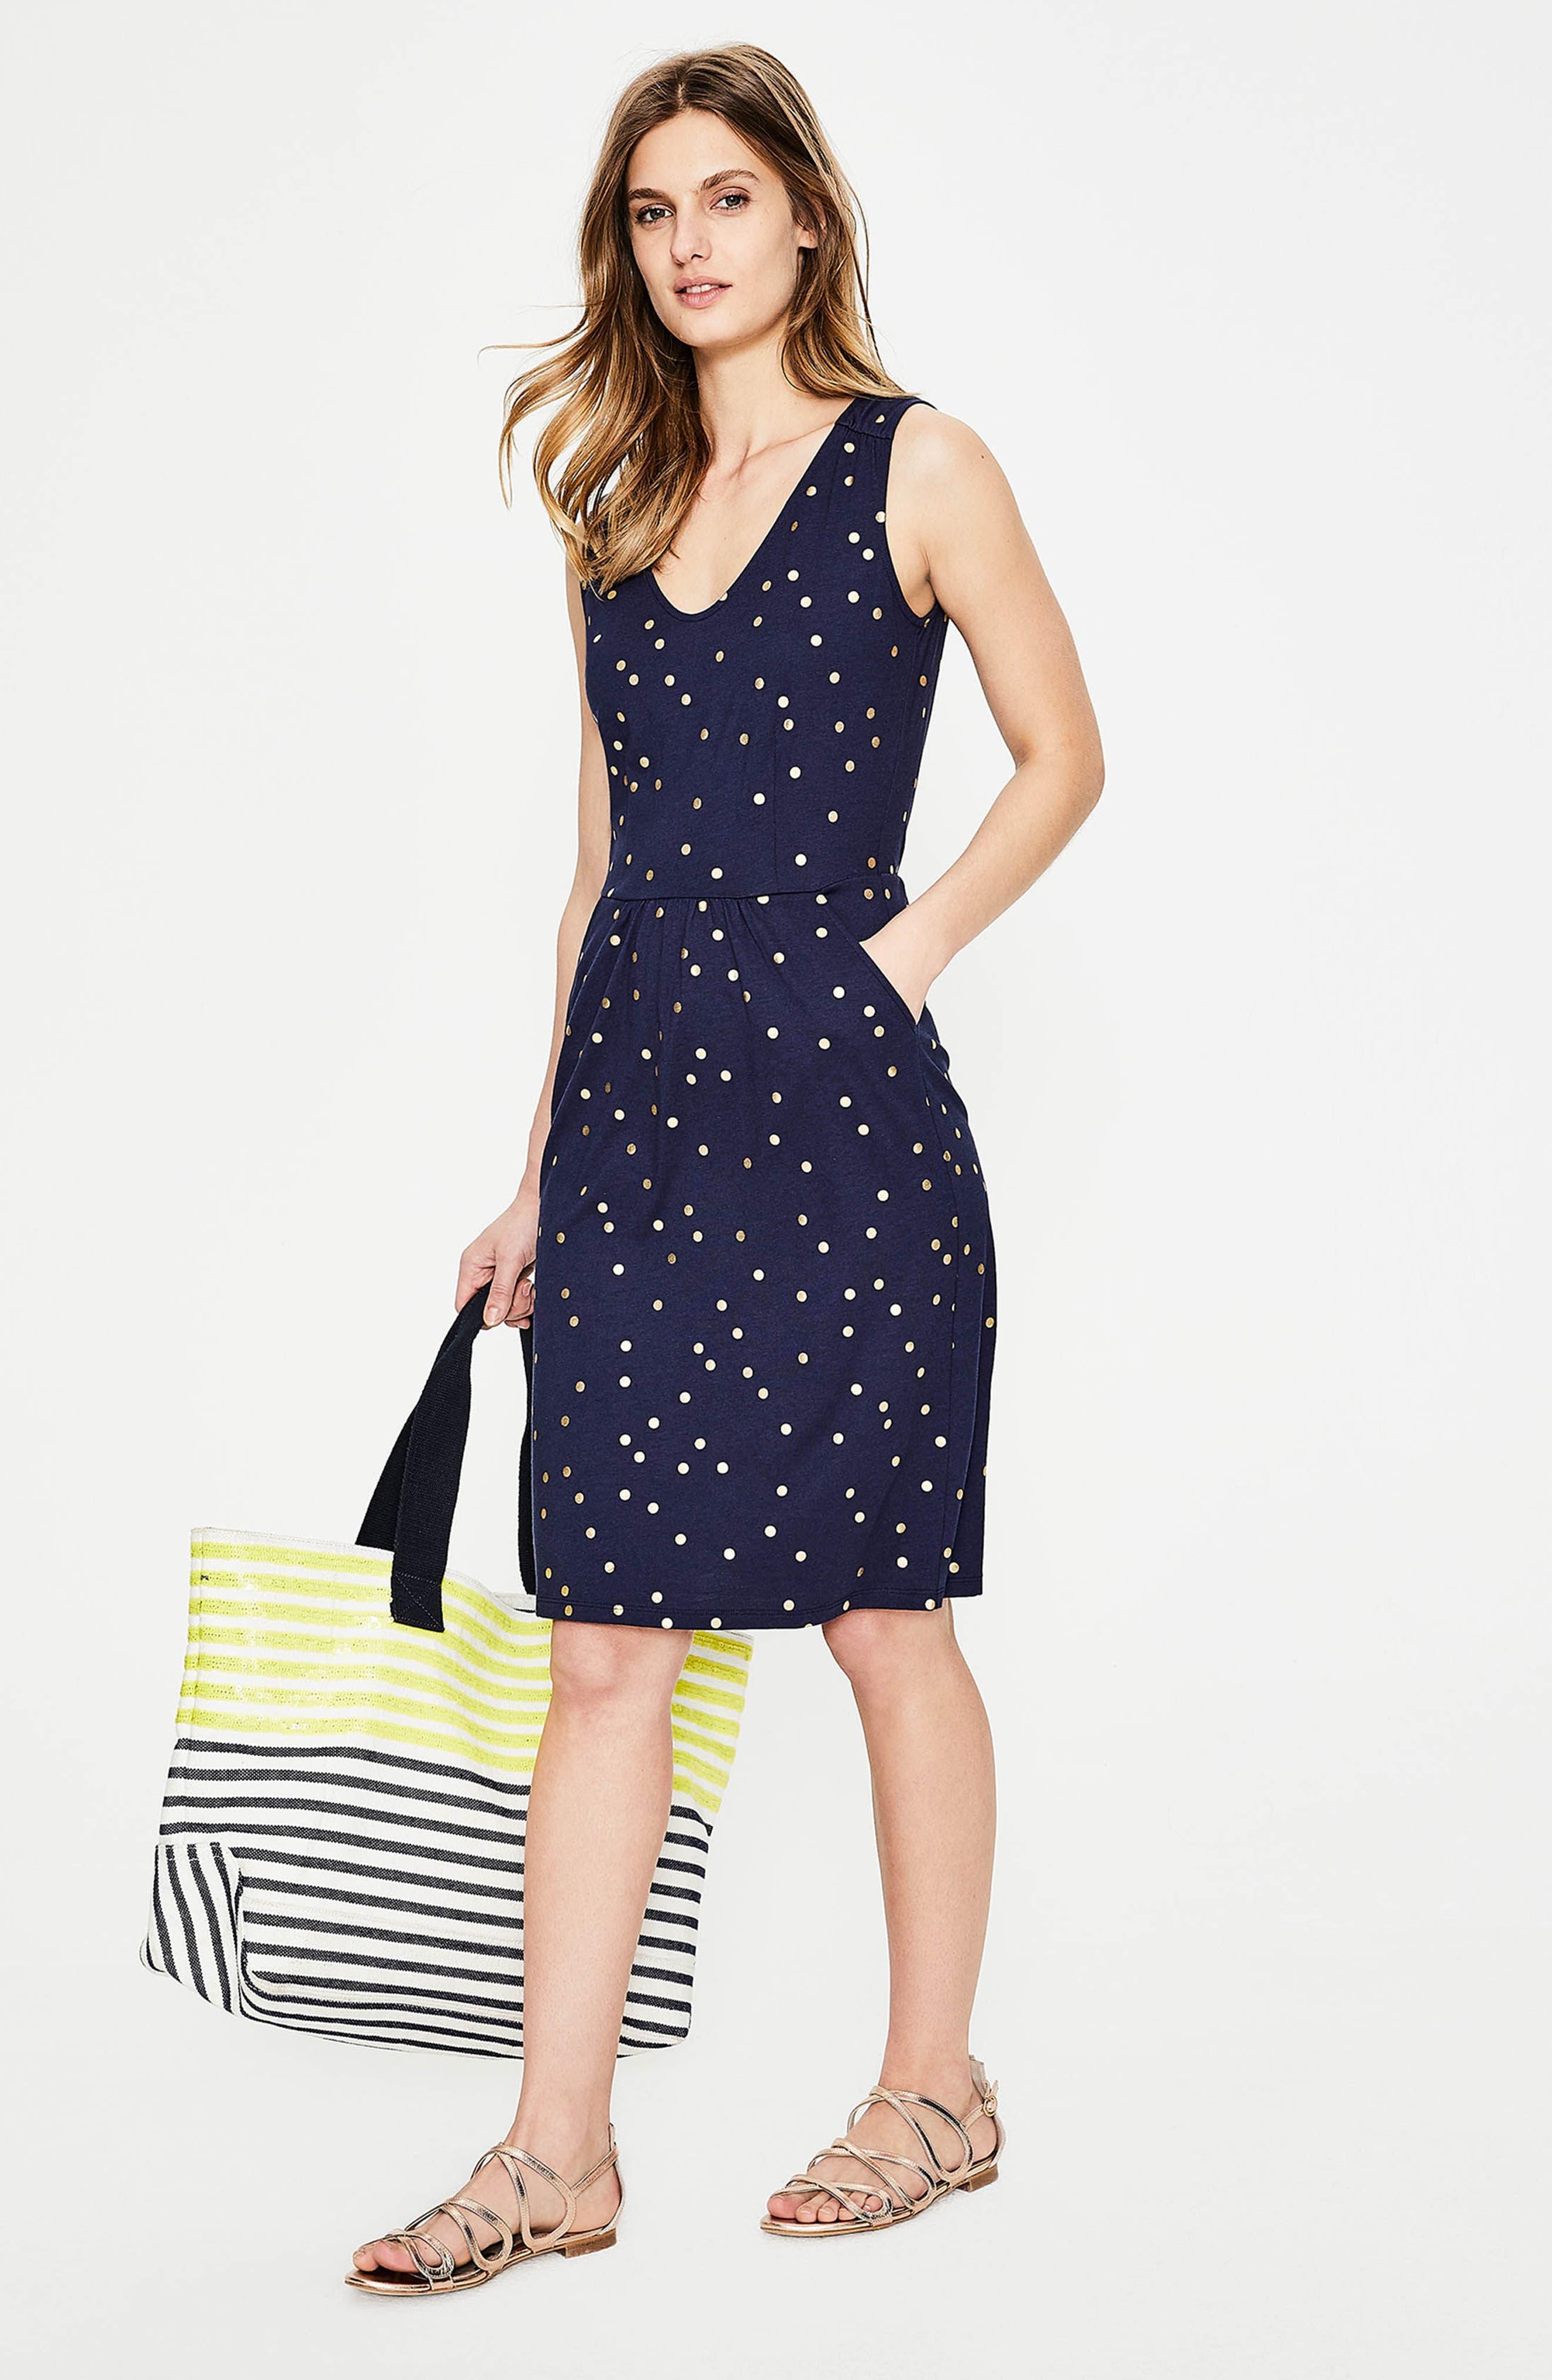 Melinda Metallic Dot Jersey Sheath Dress,                             Alternate thumbnail 4, color,                             414